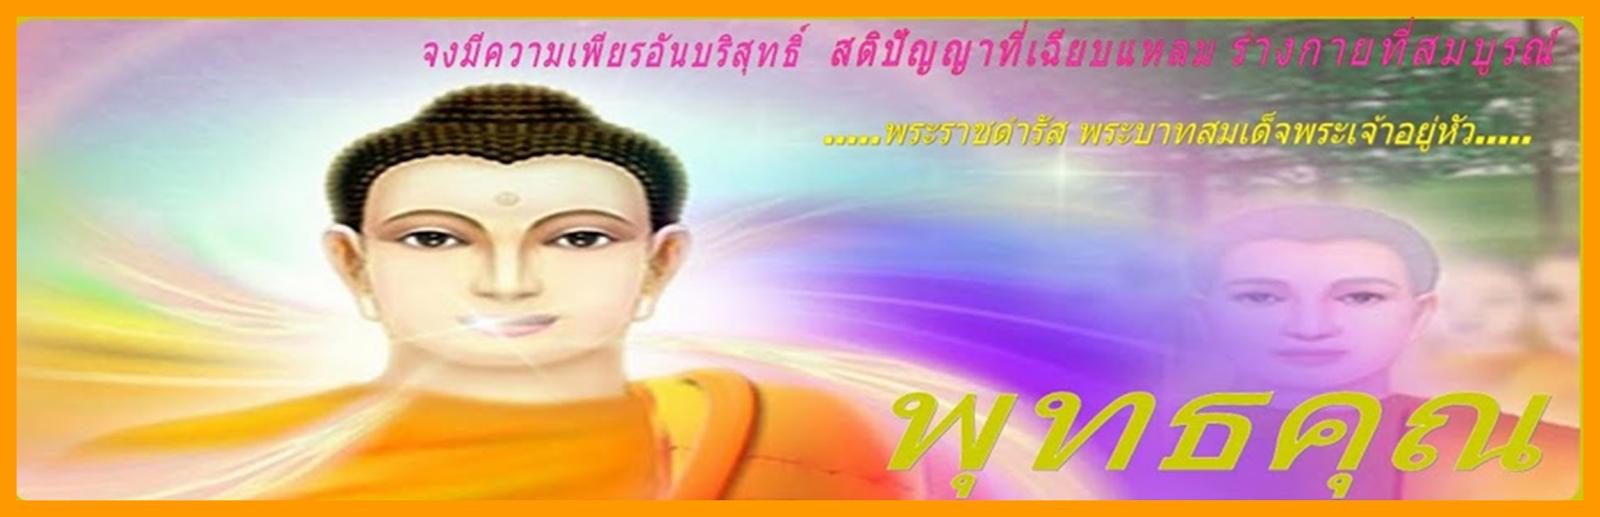 Bhuddhakhun